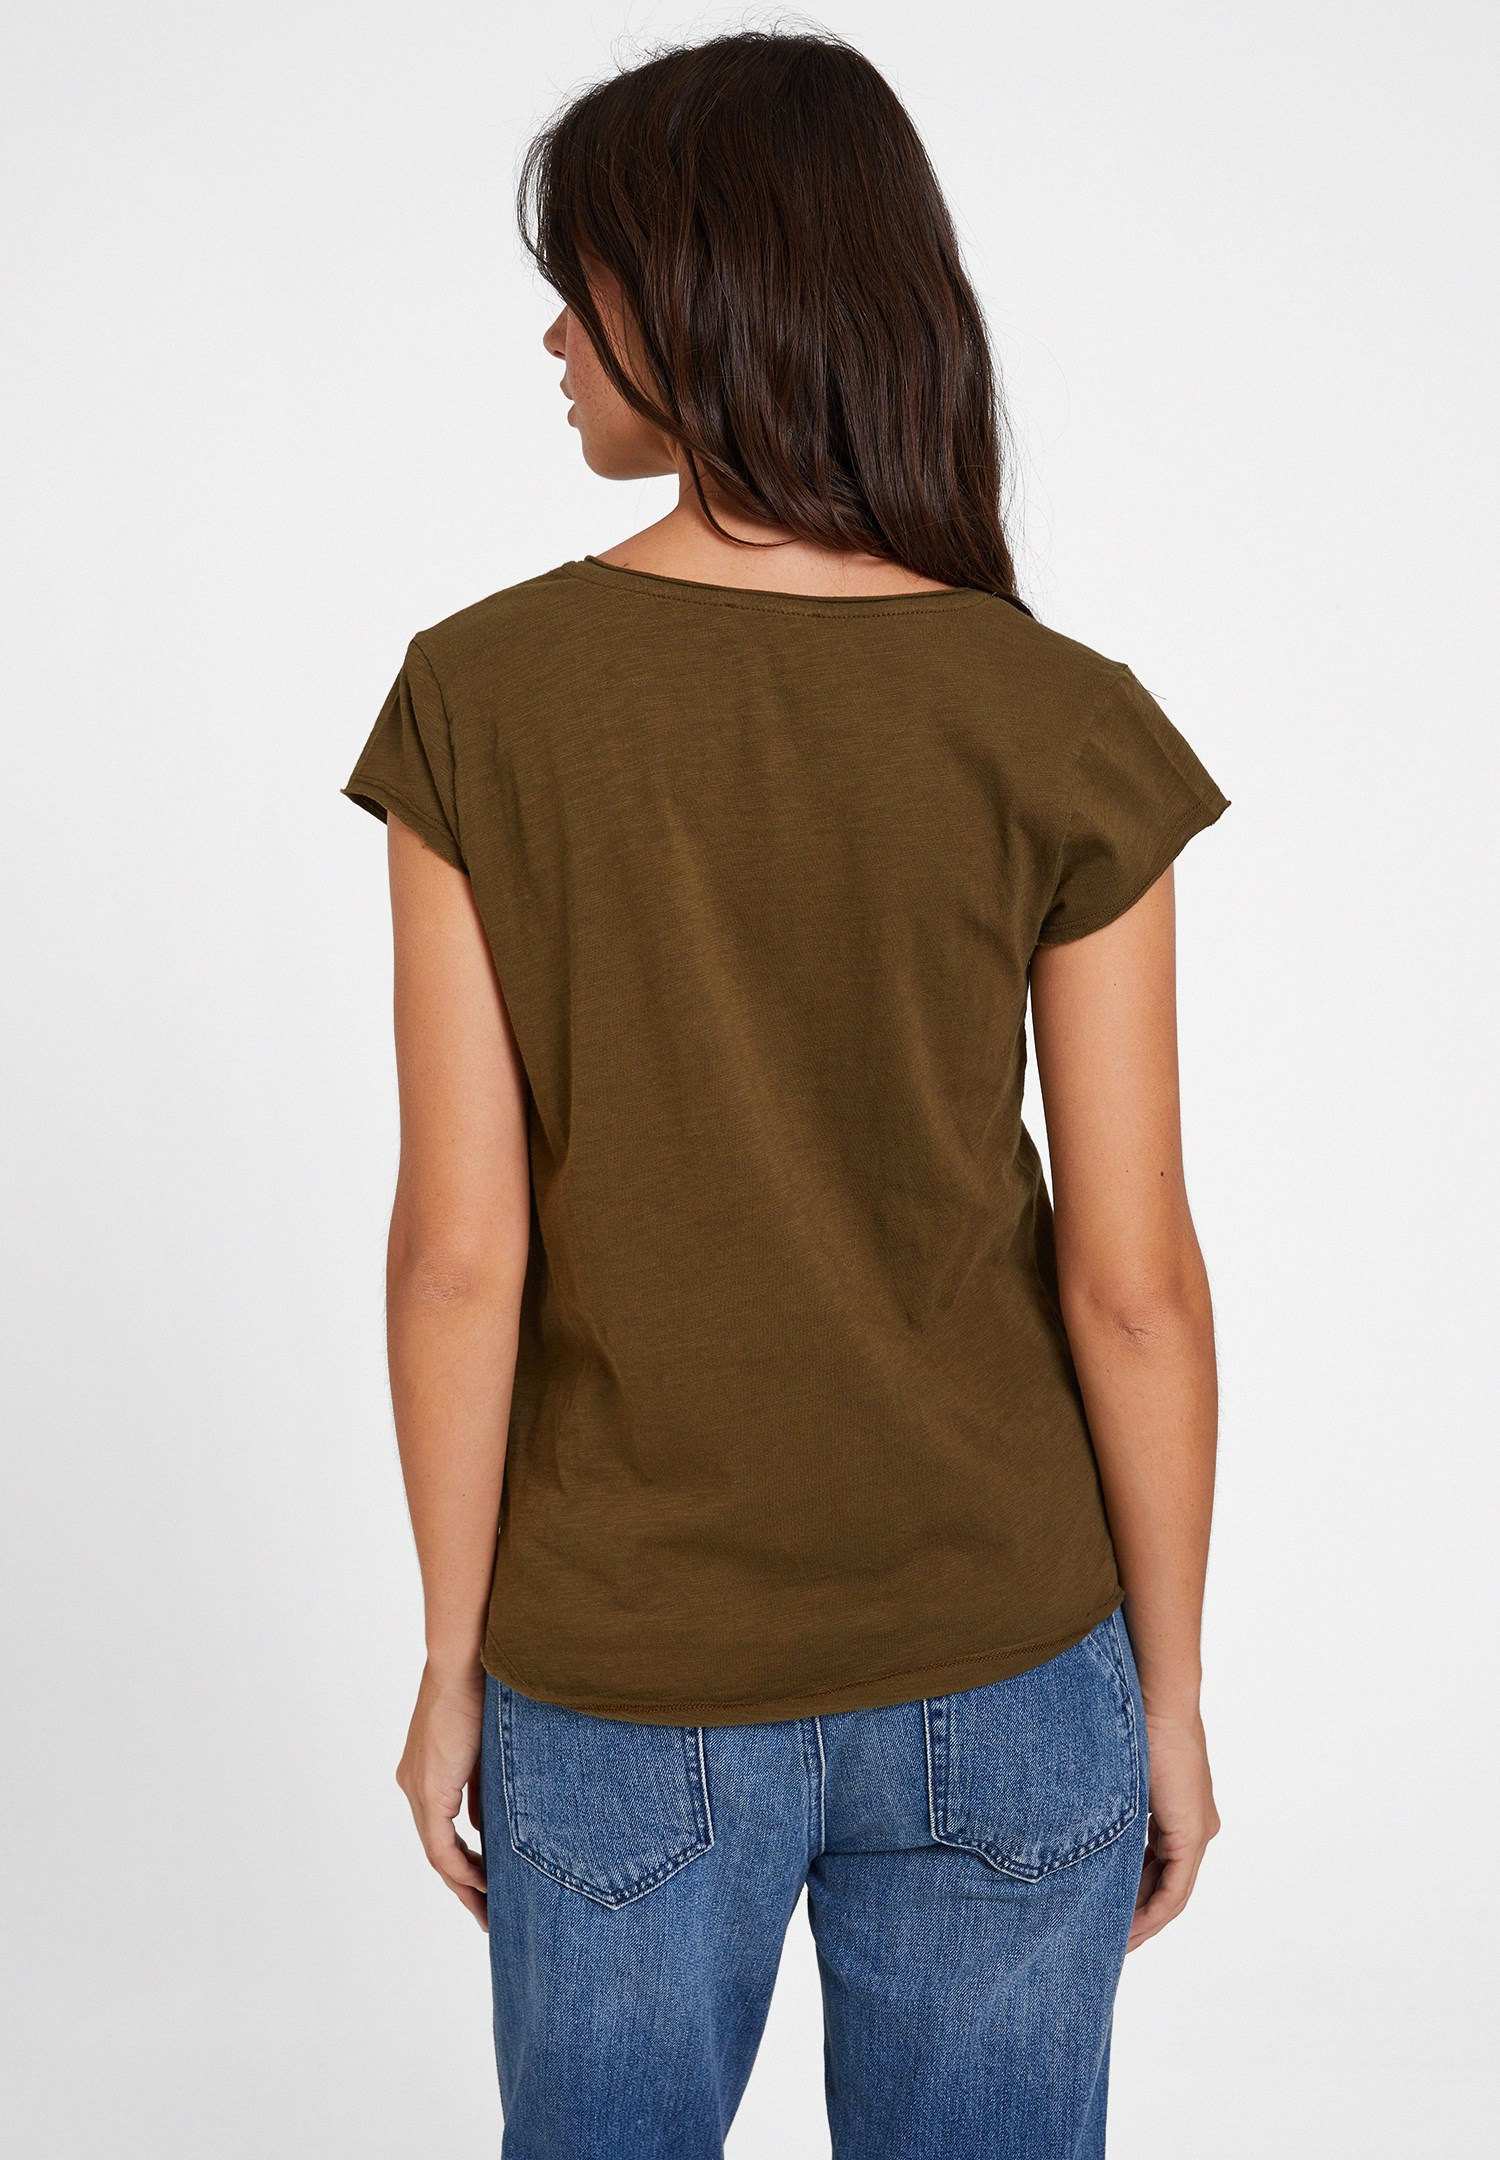 Bayan Yeşil Basic V Yaka Kısa Kollu Tişört